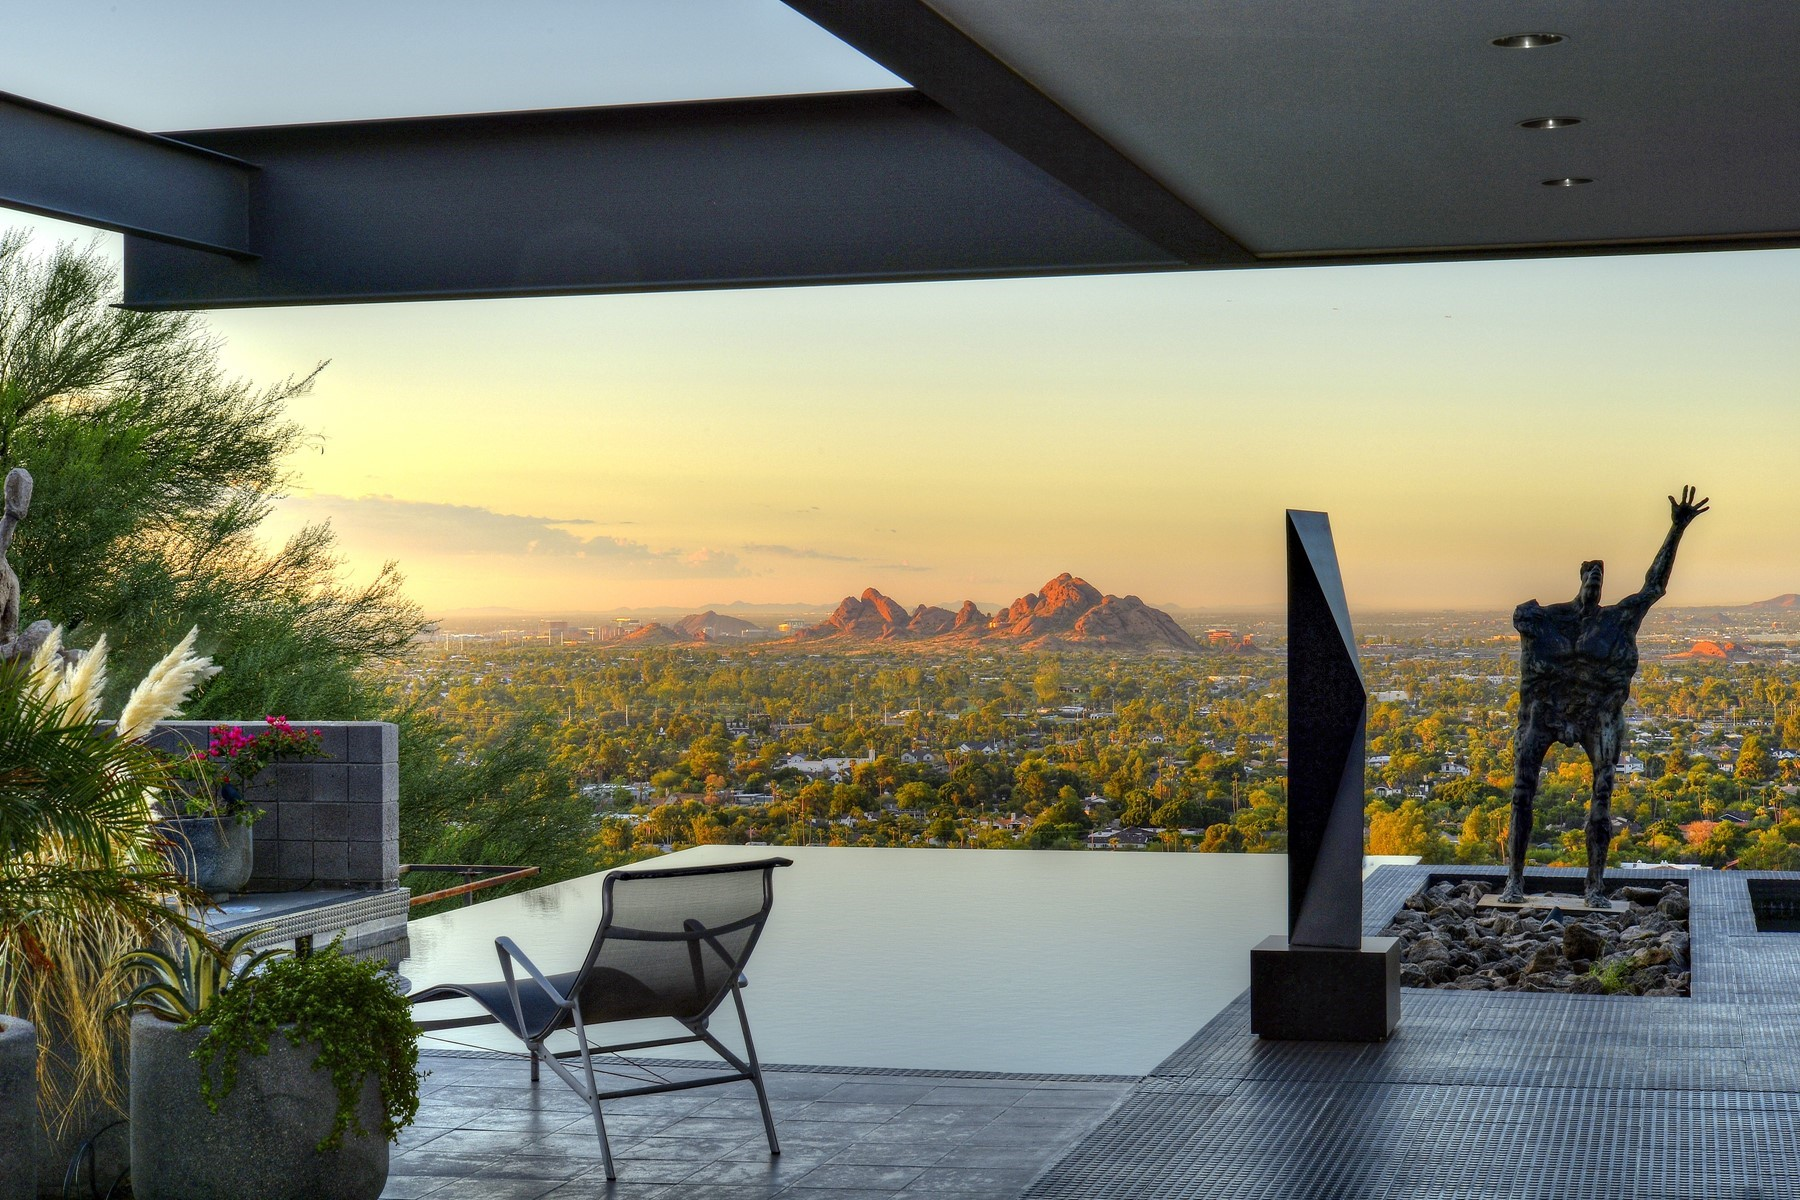 Single Family Homes for Sale at Copeland Hill 2 5402 E VALLE VISTA RD Phoenix, Arizona 85018 United States